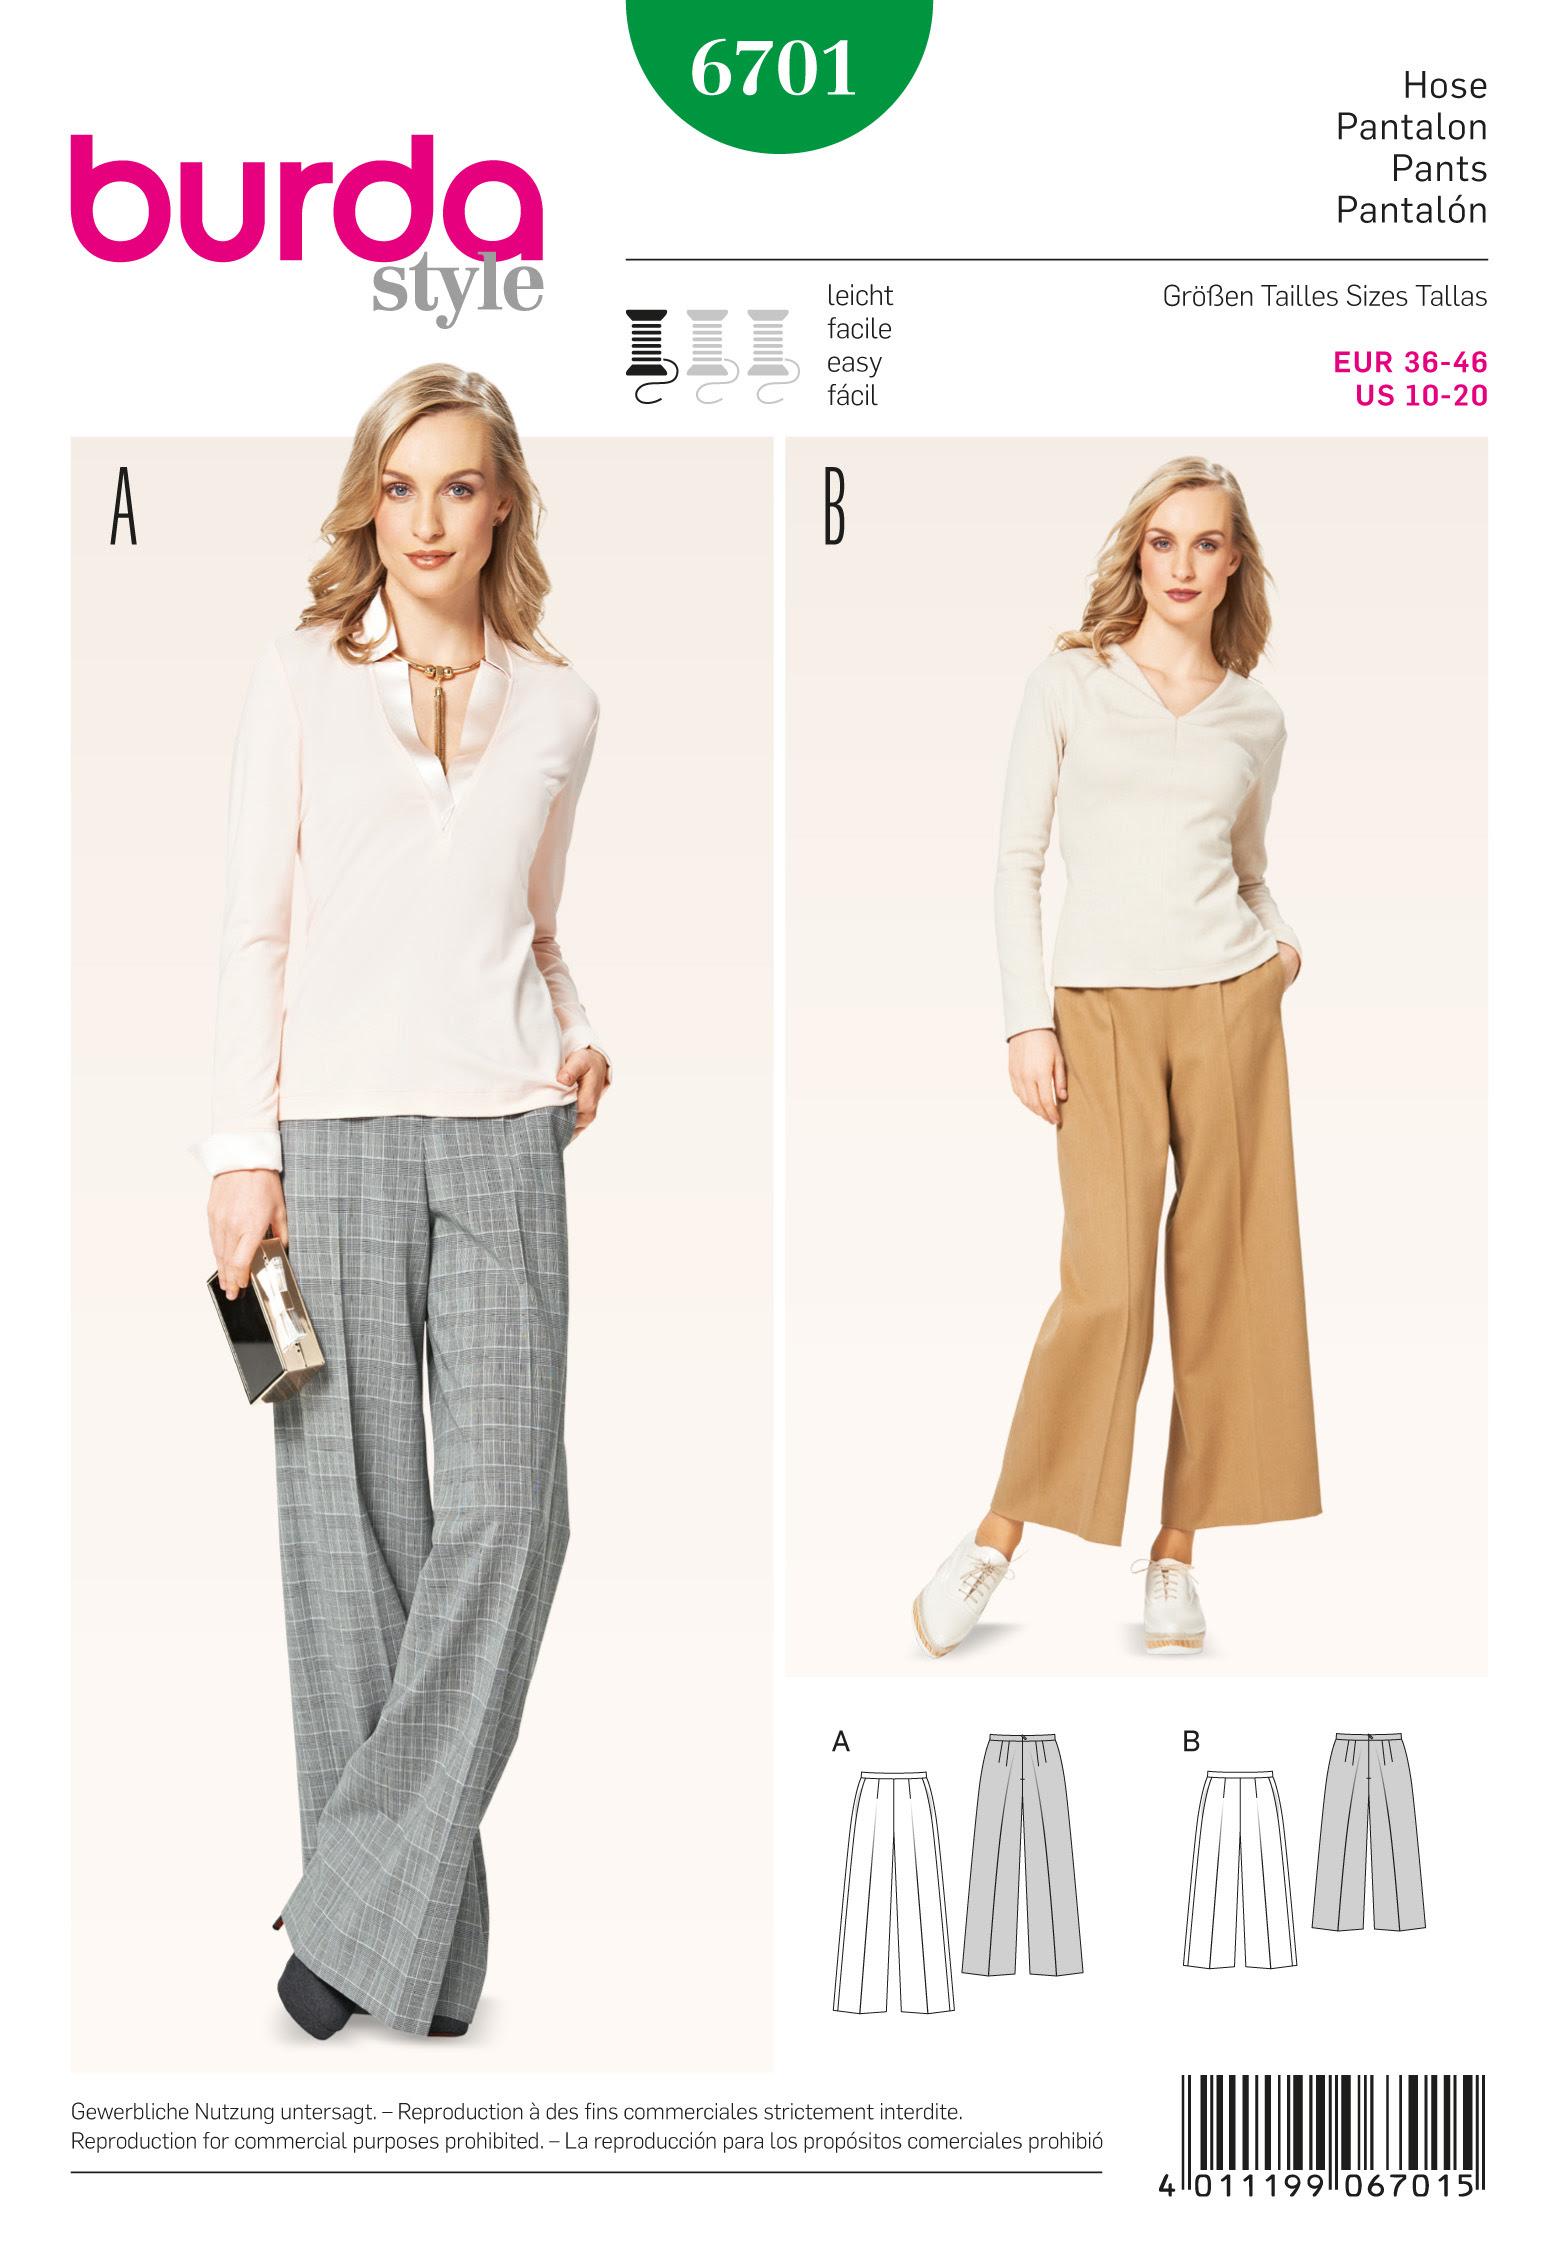 Burda Misses' Pants 6701